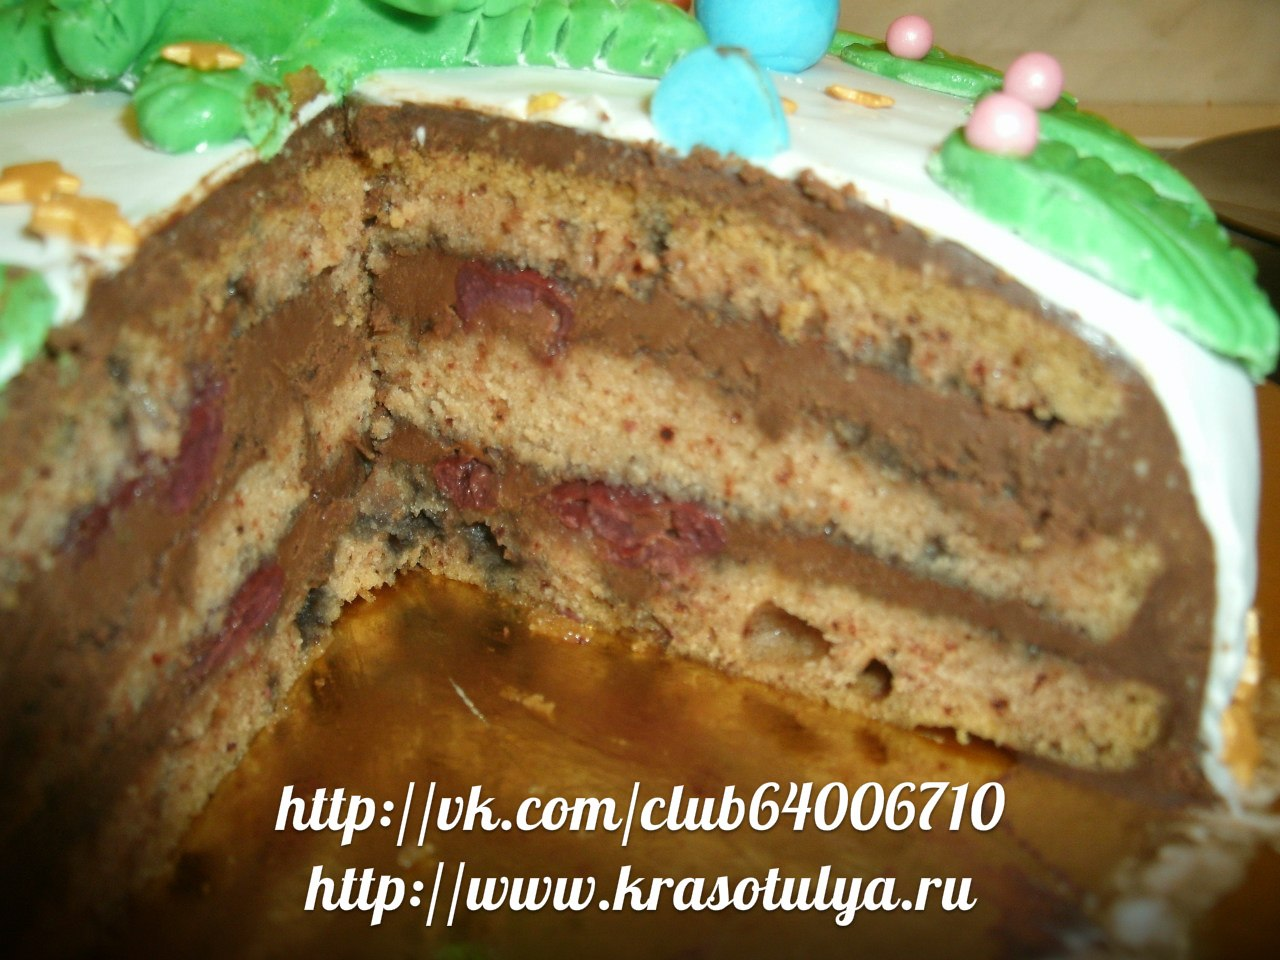 Торт рецепт под мастику в домашних условиях с фото пошагово